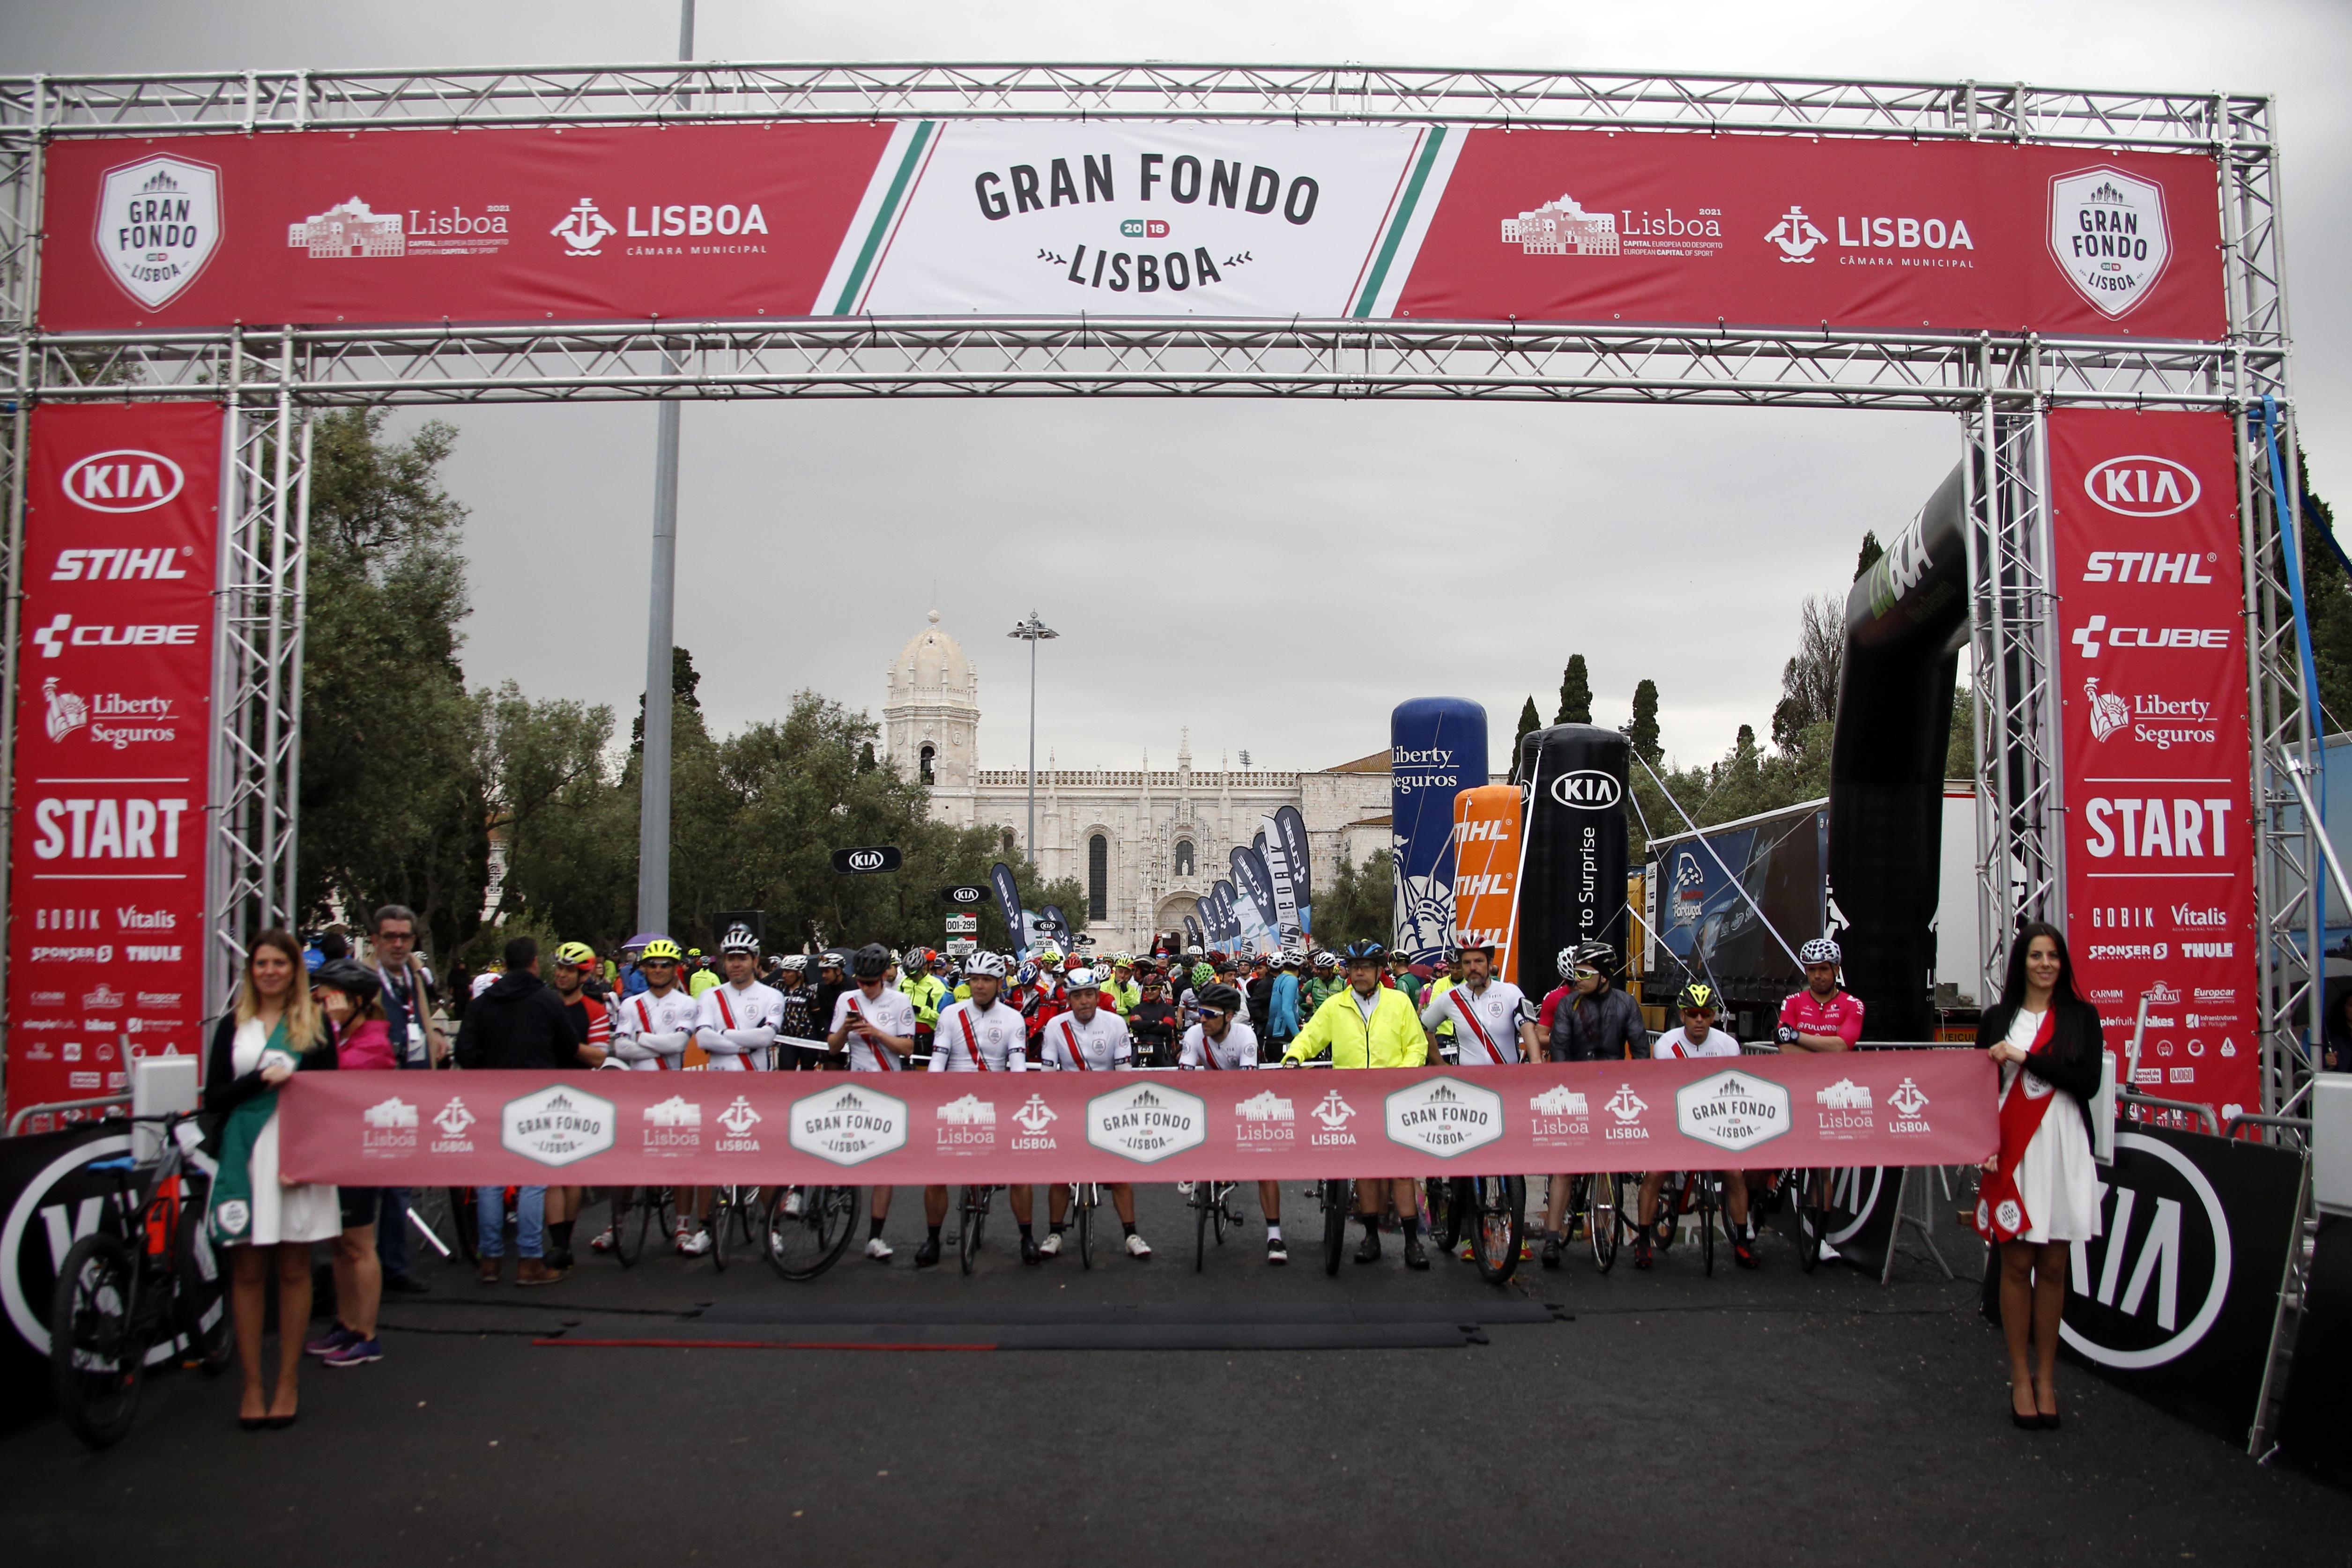 Gran Fondo Lisboa